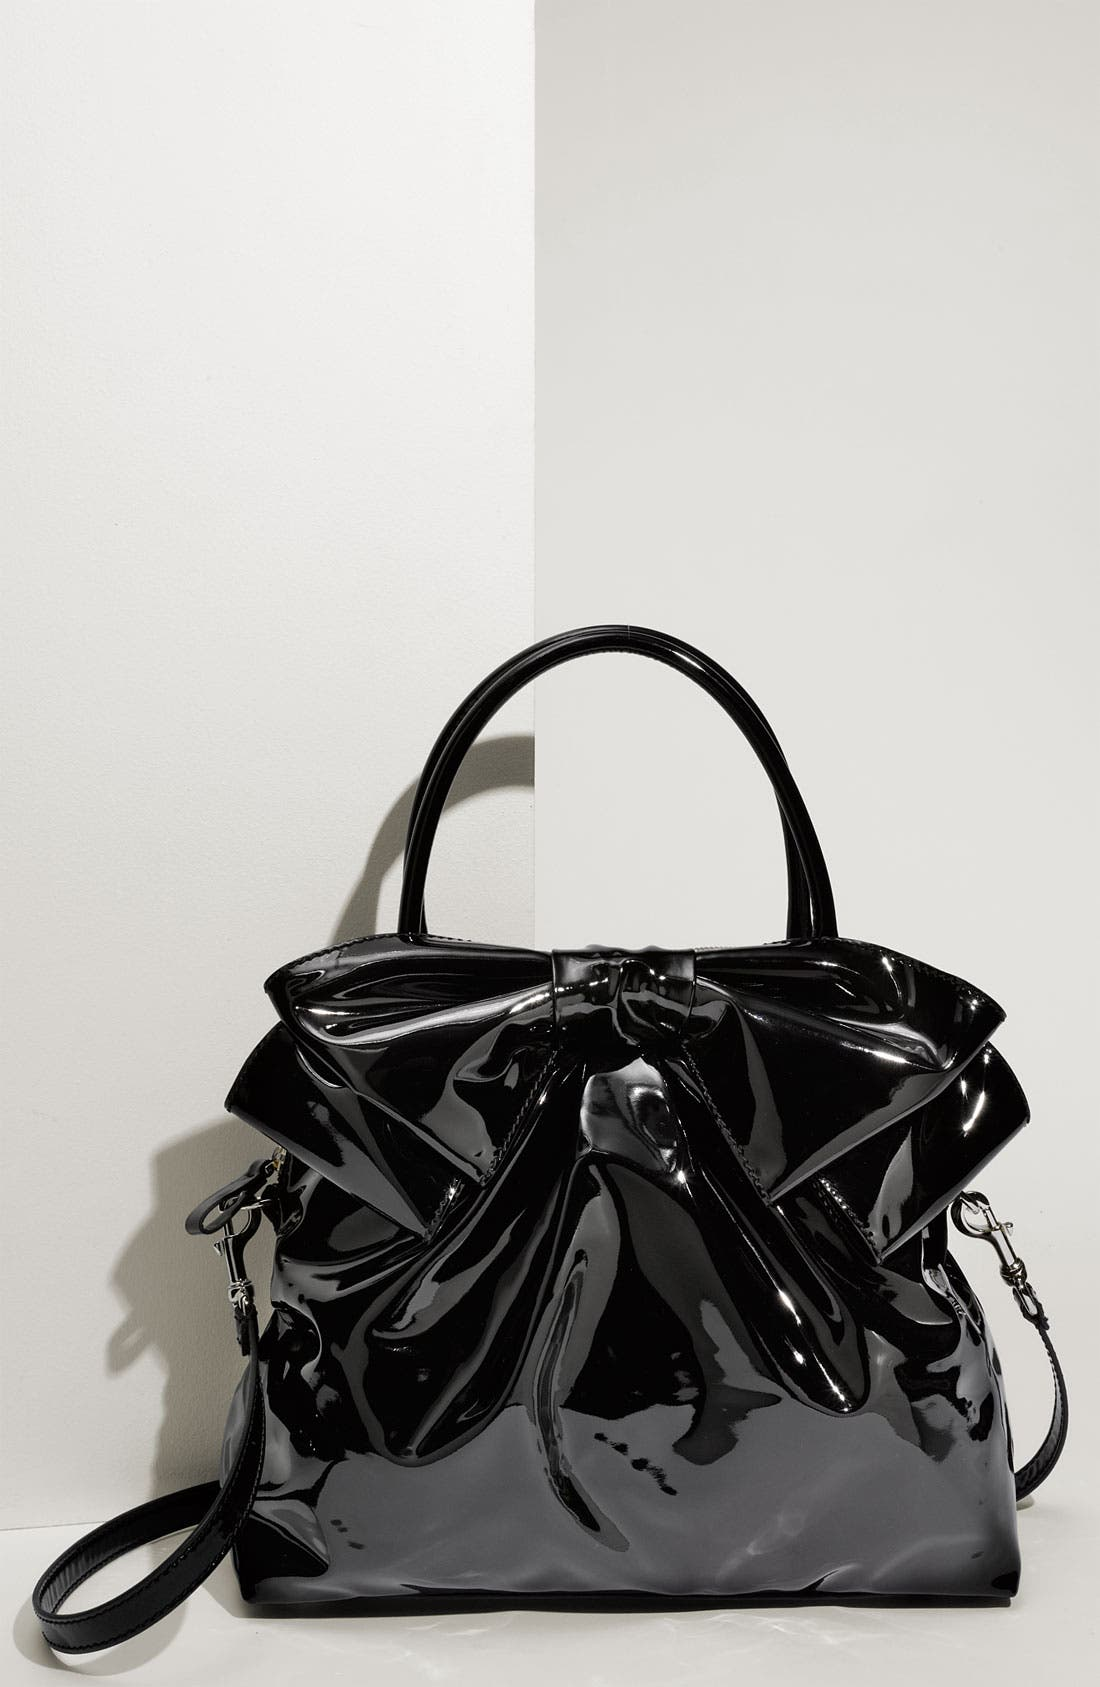 Alternate Image 1 Selected - Valentino 'Lacca Bow' Dome Handbag